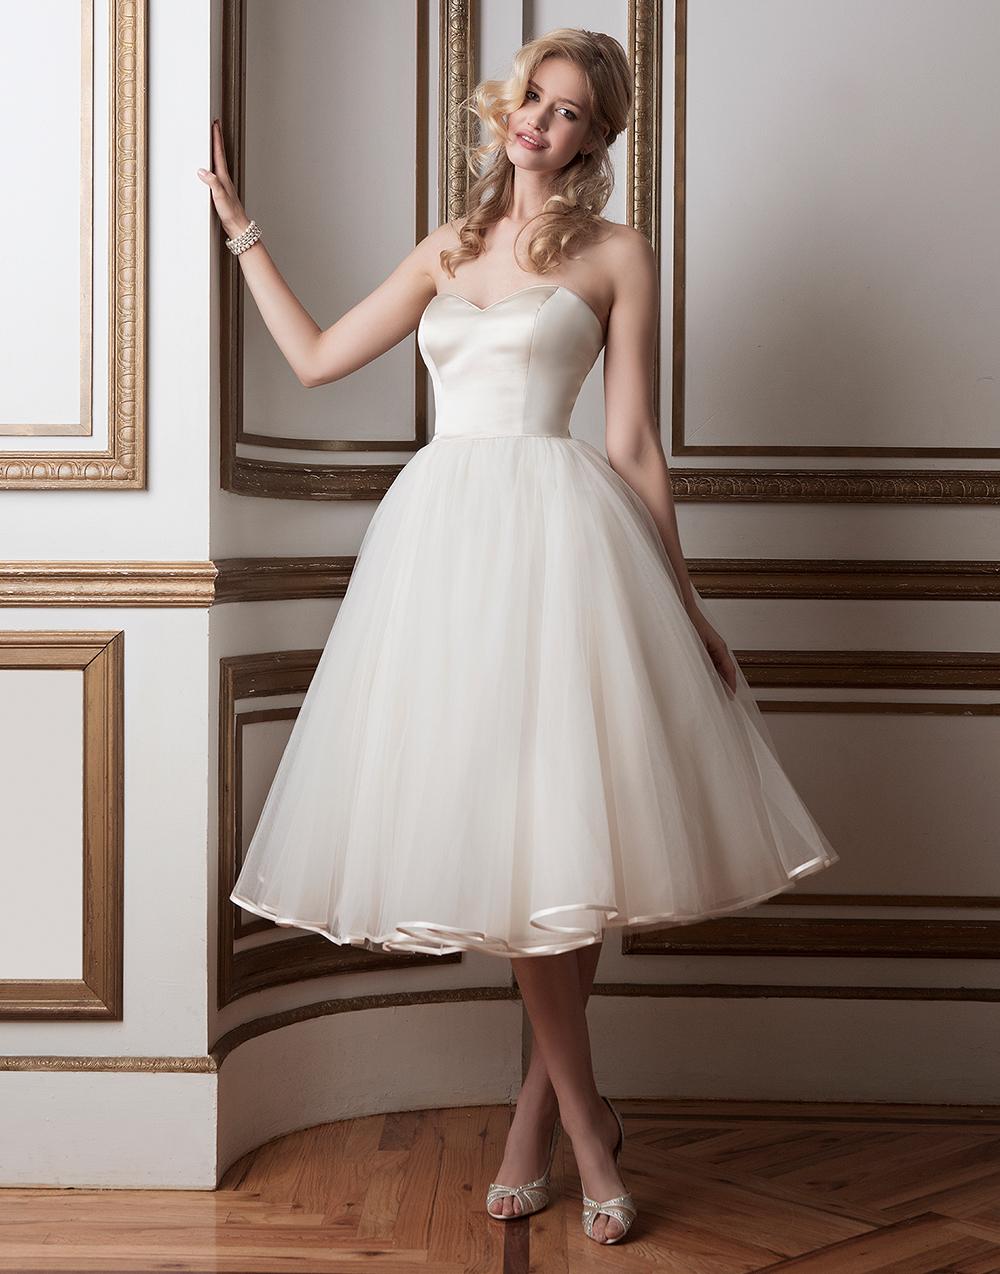 471529fc01cb Vintage Wedding Dresses Images